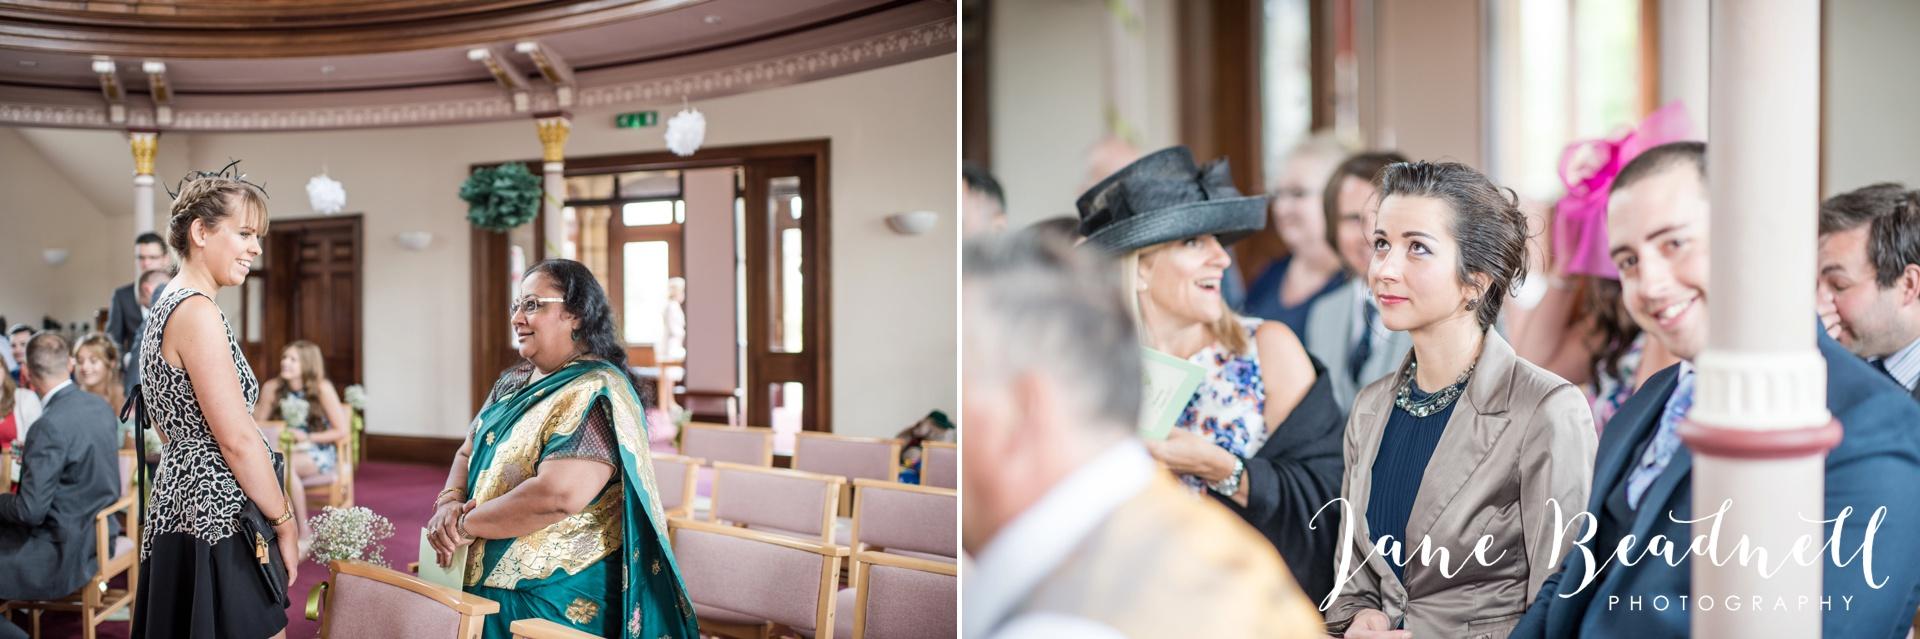 Jane Beadnell fine art wedding photographer The Old Deanery Ripon_0020